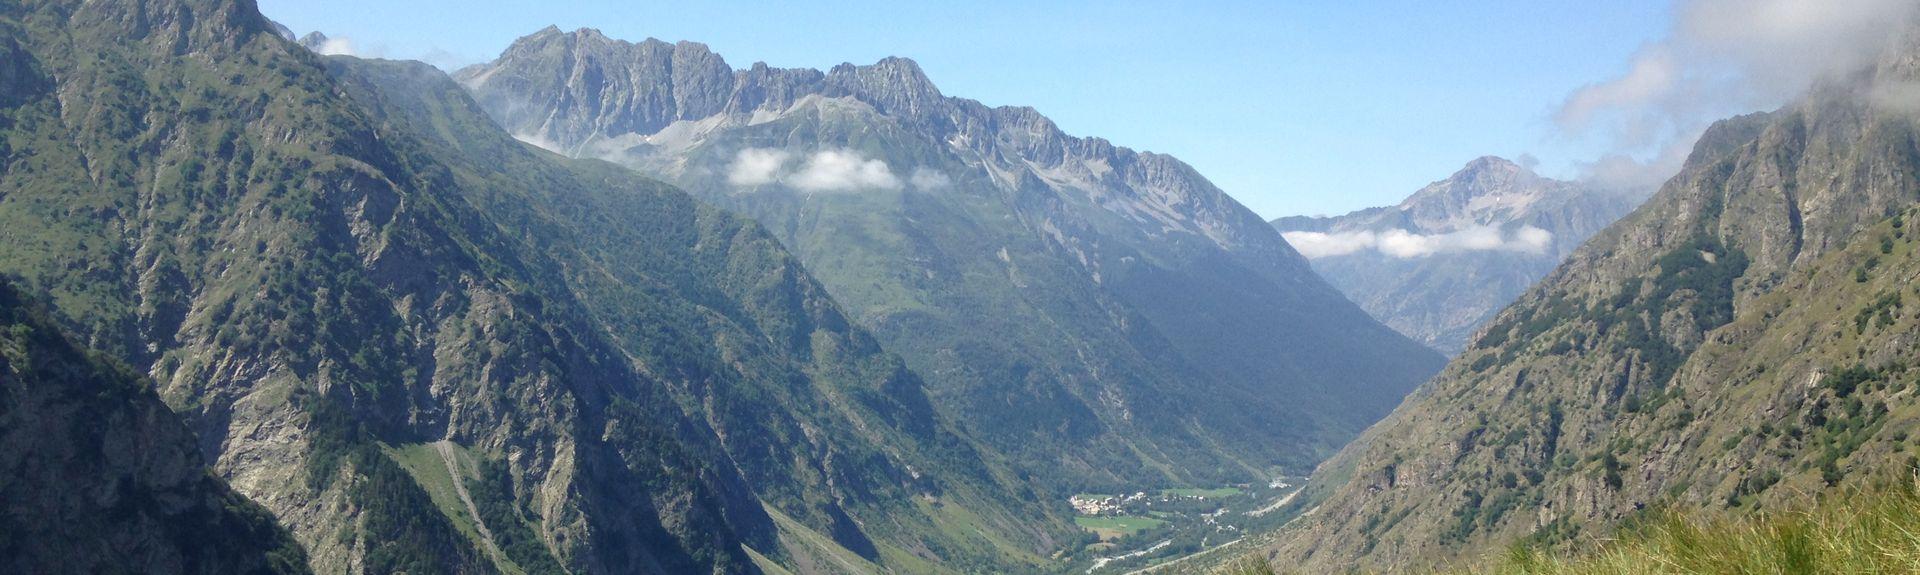 Chauffayer, Hautes-Alpes, Frankrike